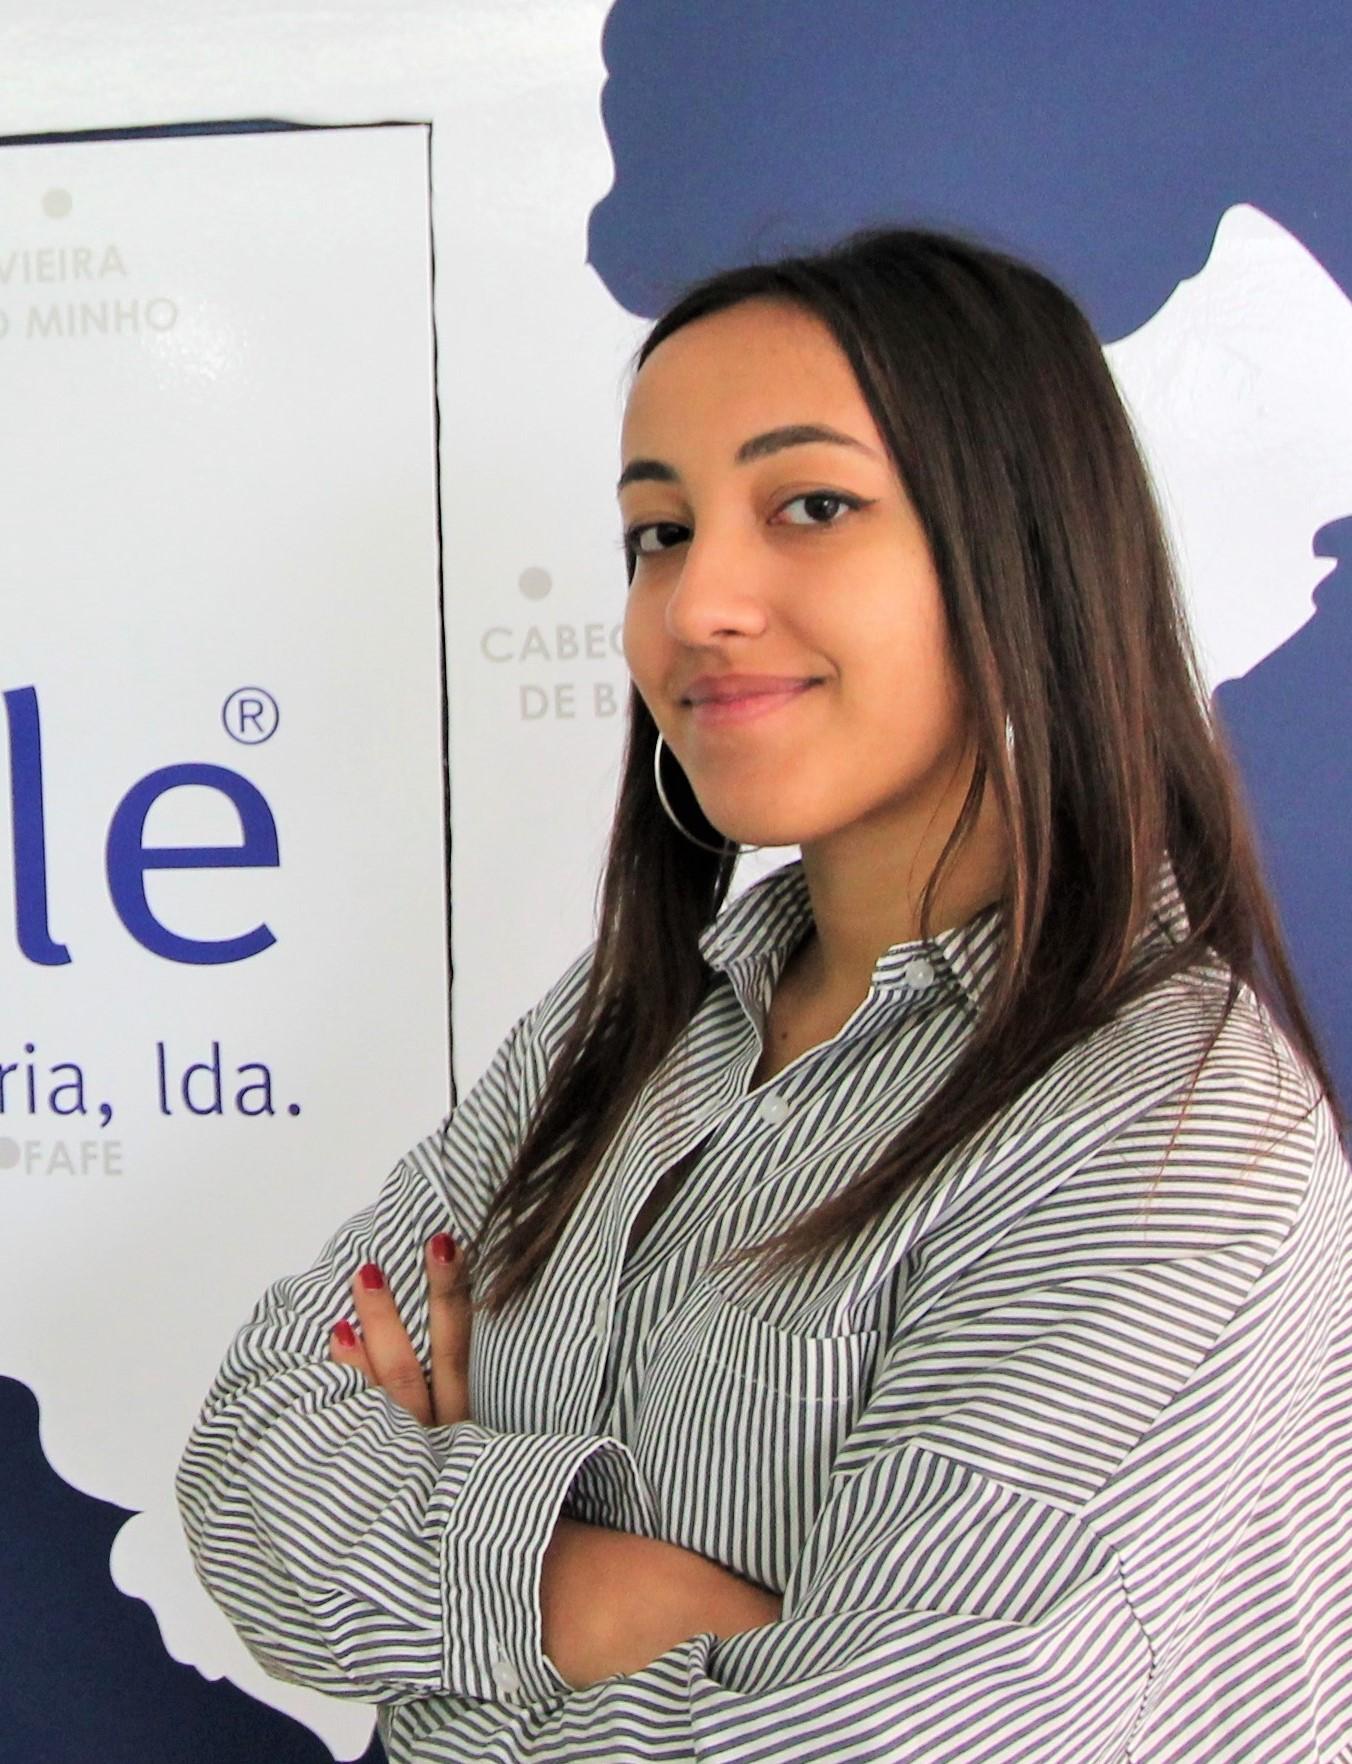 Matilde Veiga